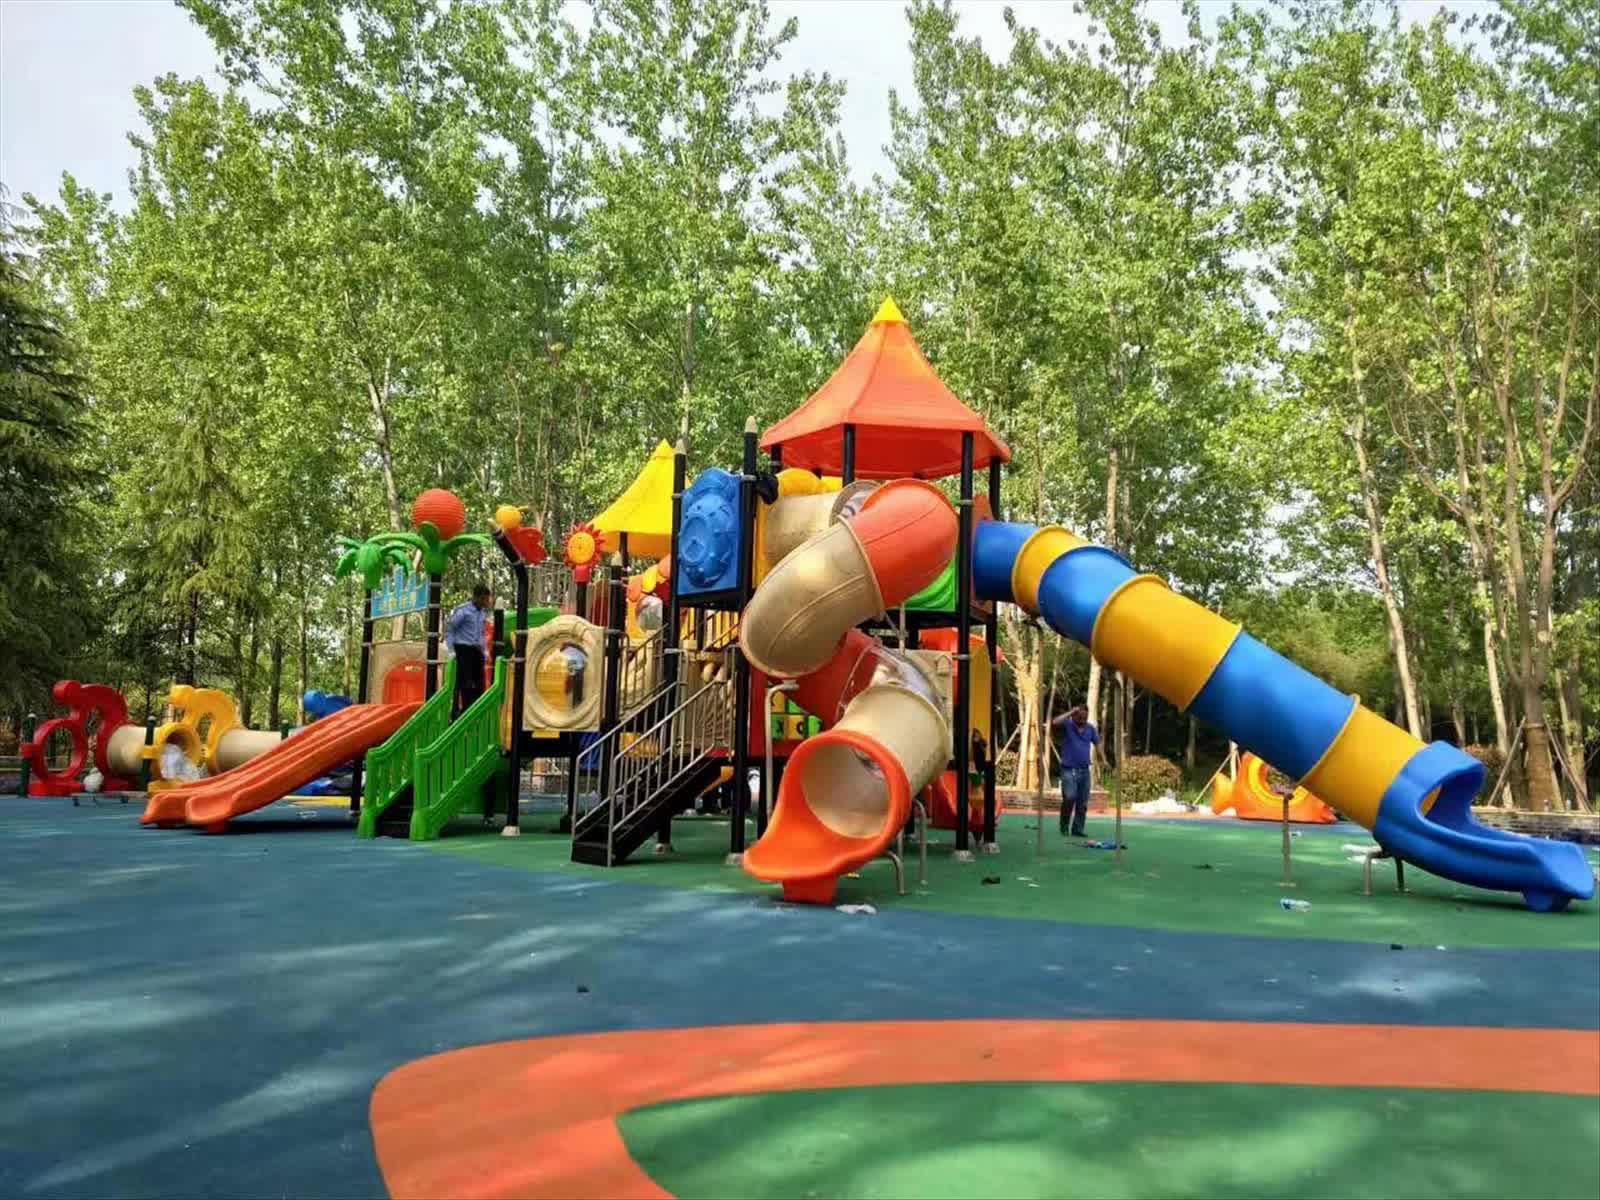 Plastic Playground Slide Material Kids Play Area